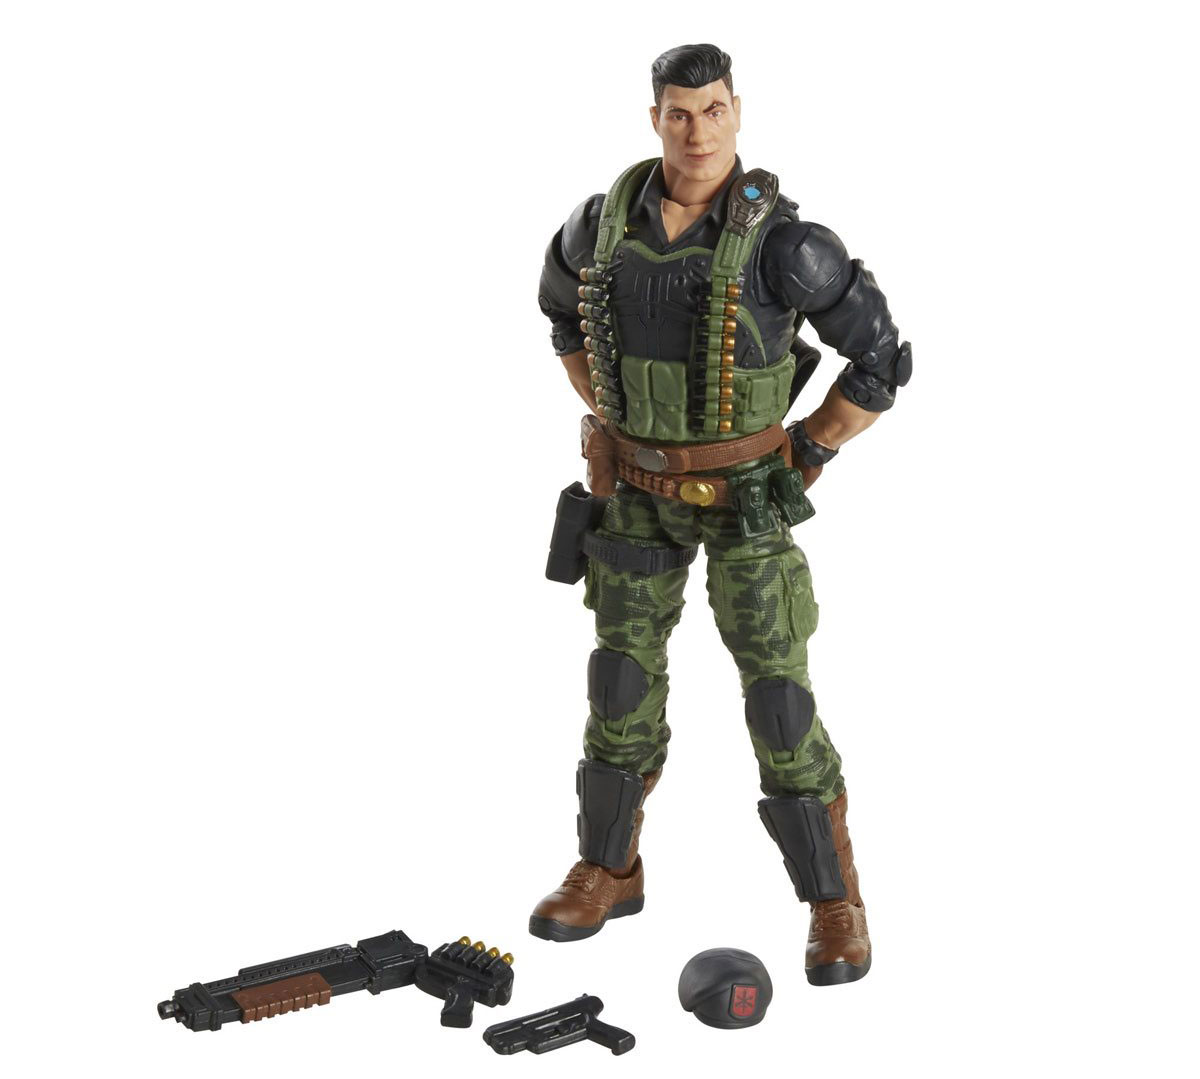 gi-joe-classified-series-flint-action-figure-5